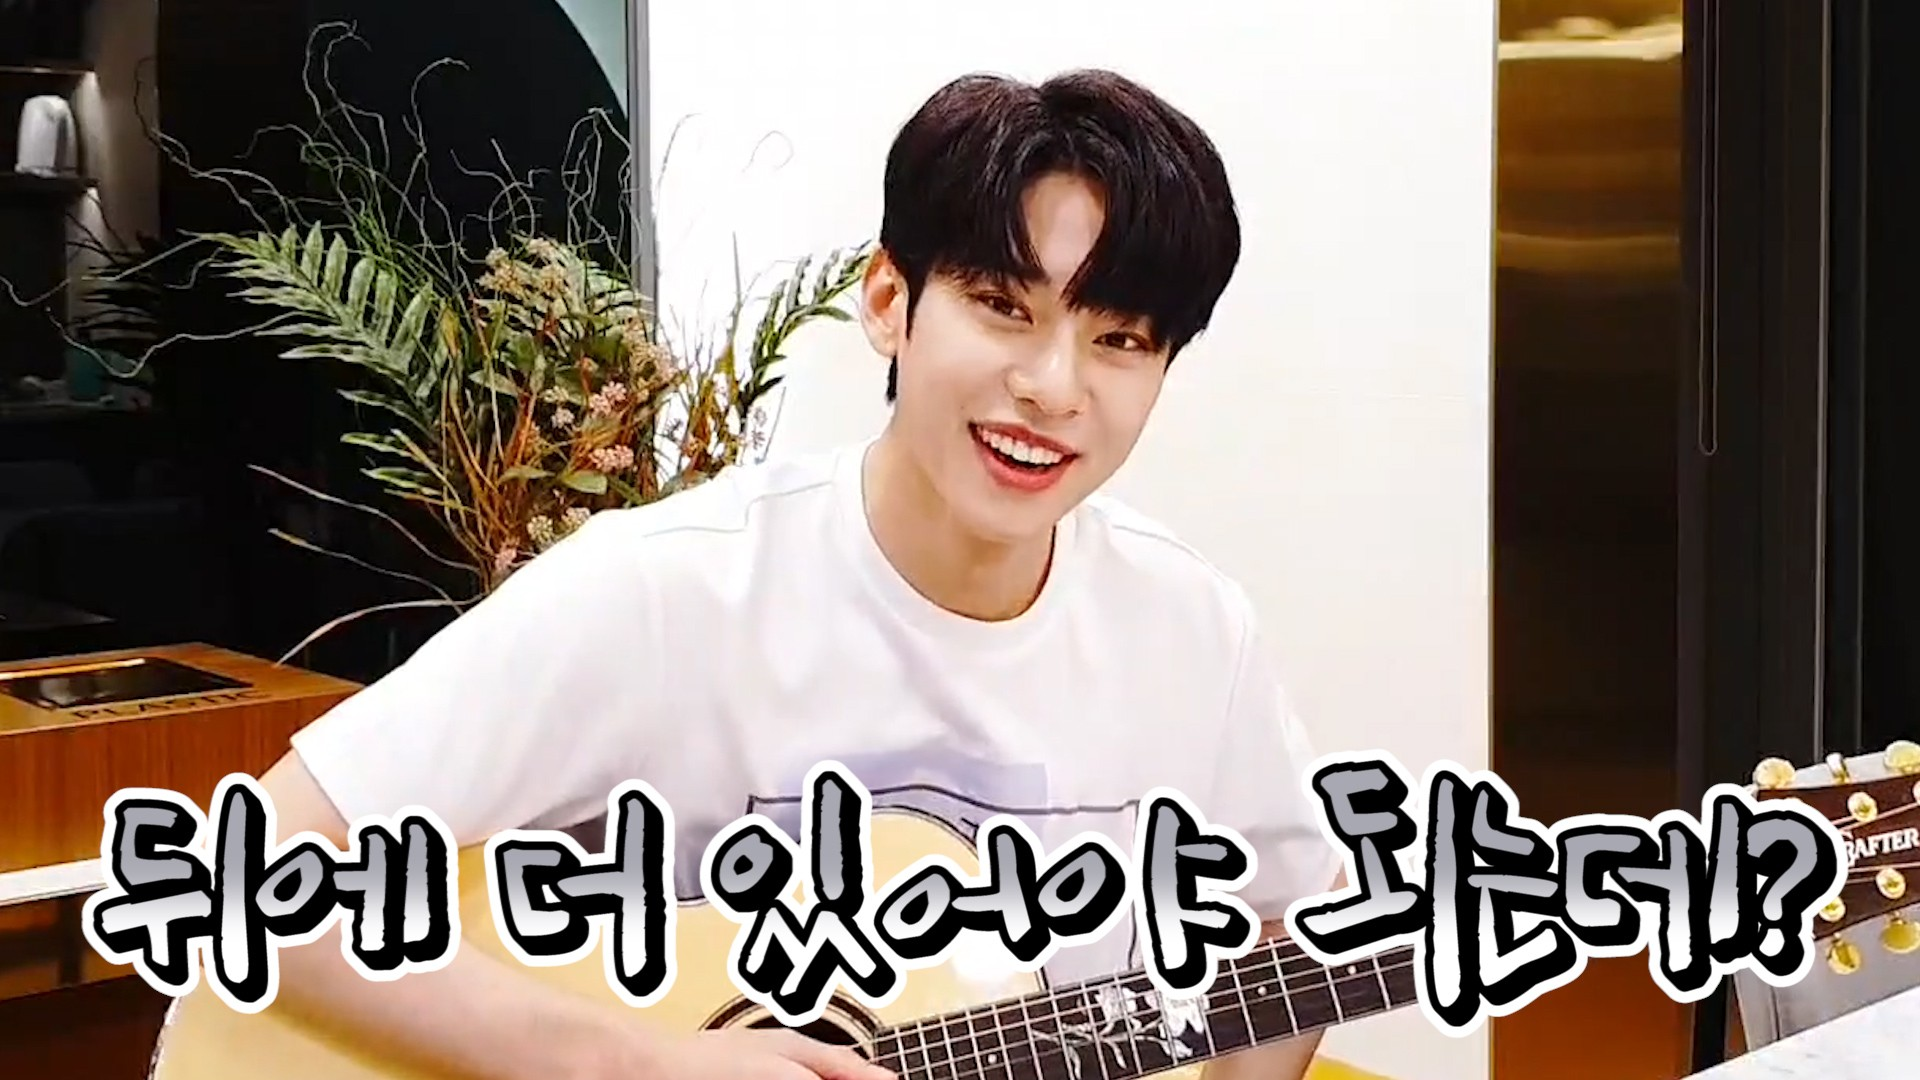 [AB6IX] 사혼의 가사조각을 모아모아 심야동방 콘서트🎸🎶 (Dong Hyun singing with guitar)